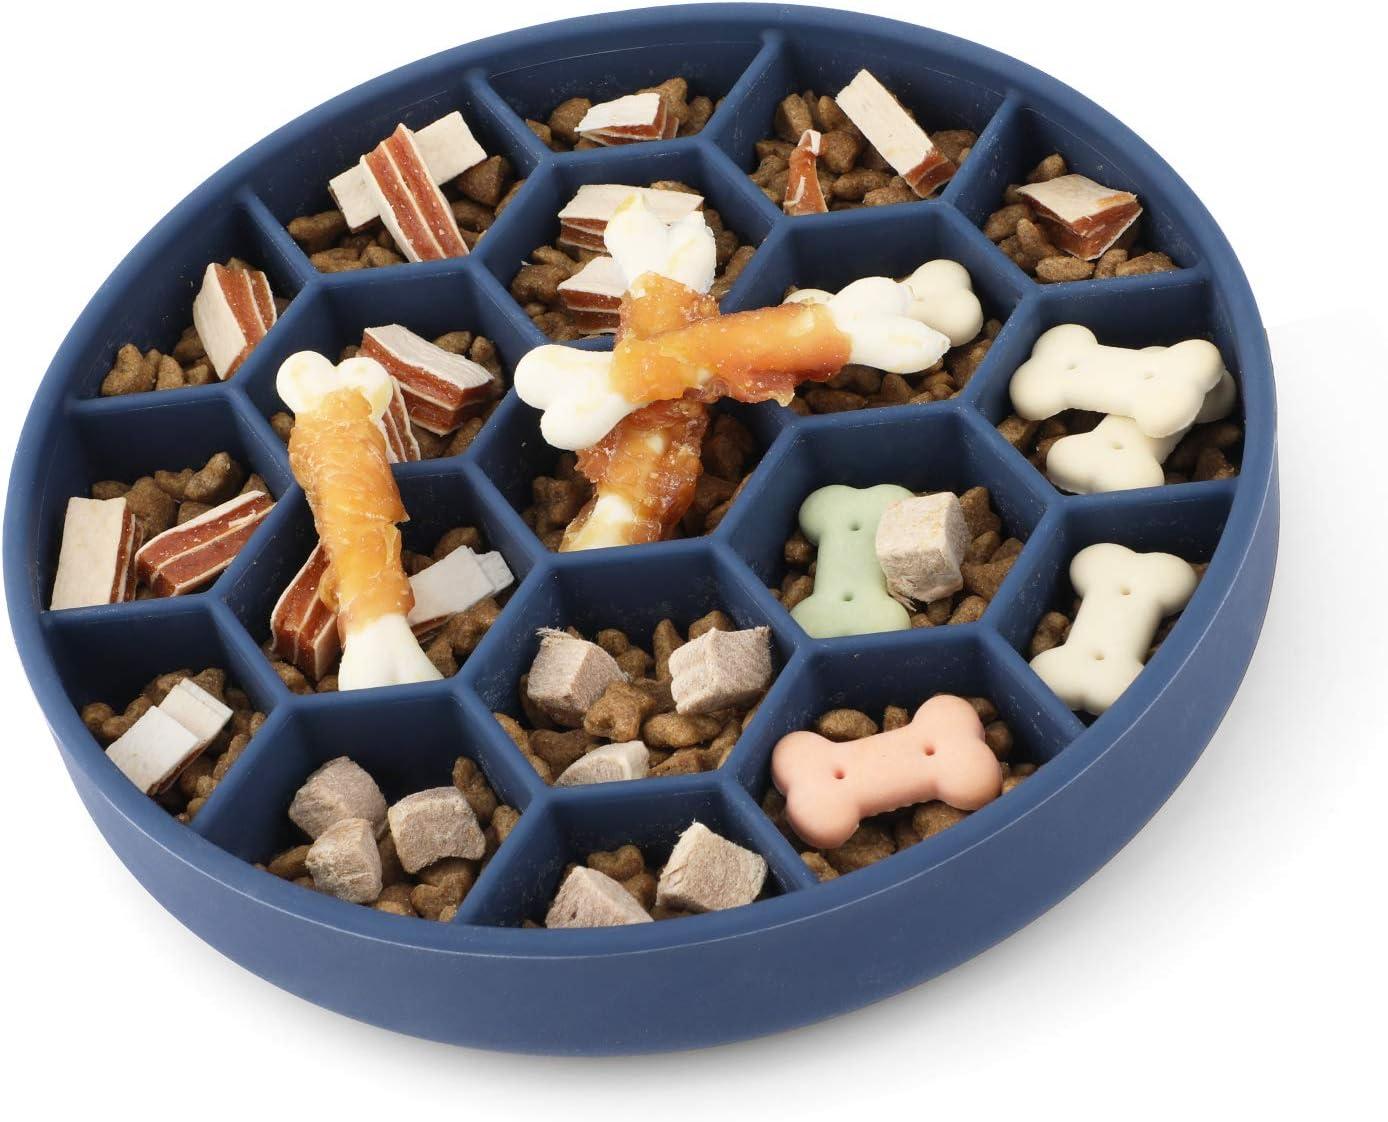 IOKHEIRA Slow Feeder Dog Bowls, Non Skid Slow Feeder Dog Bowl, Anti-Gulping Pet Slow Eating Dog Bowls, Fun Feeder Slow Bowl with Interactive Bloat Stop Dog Bowls